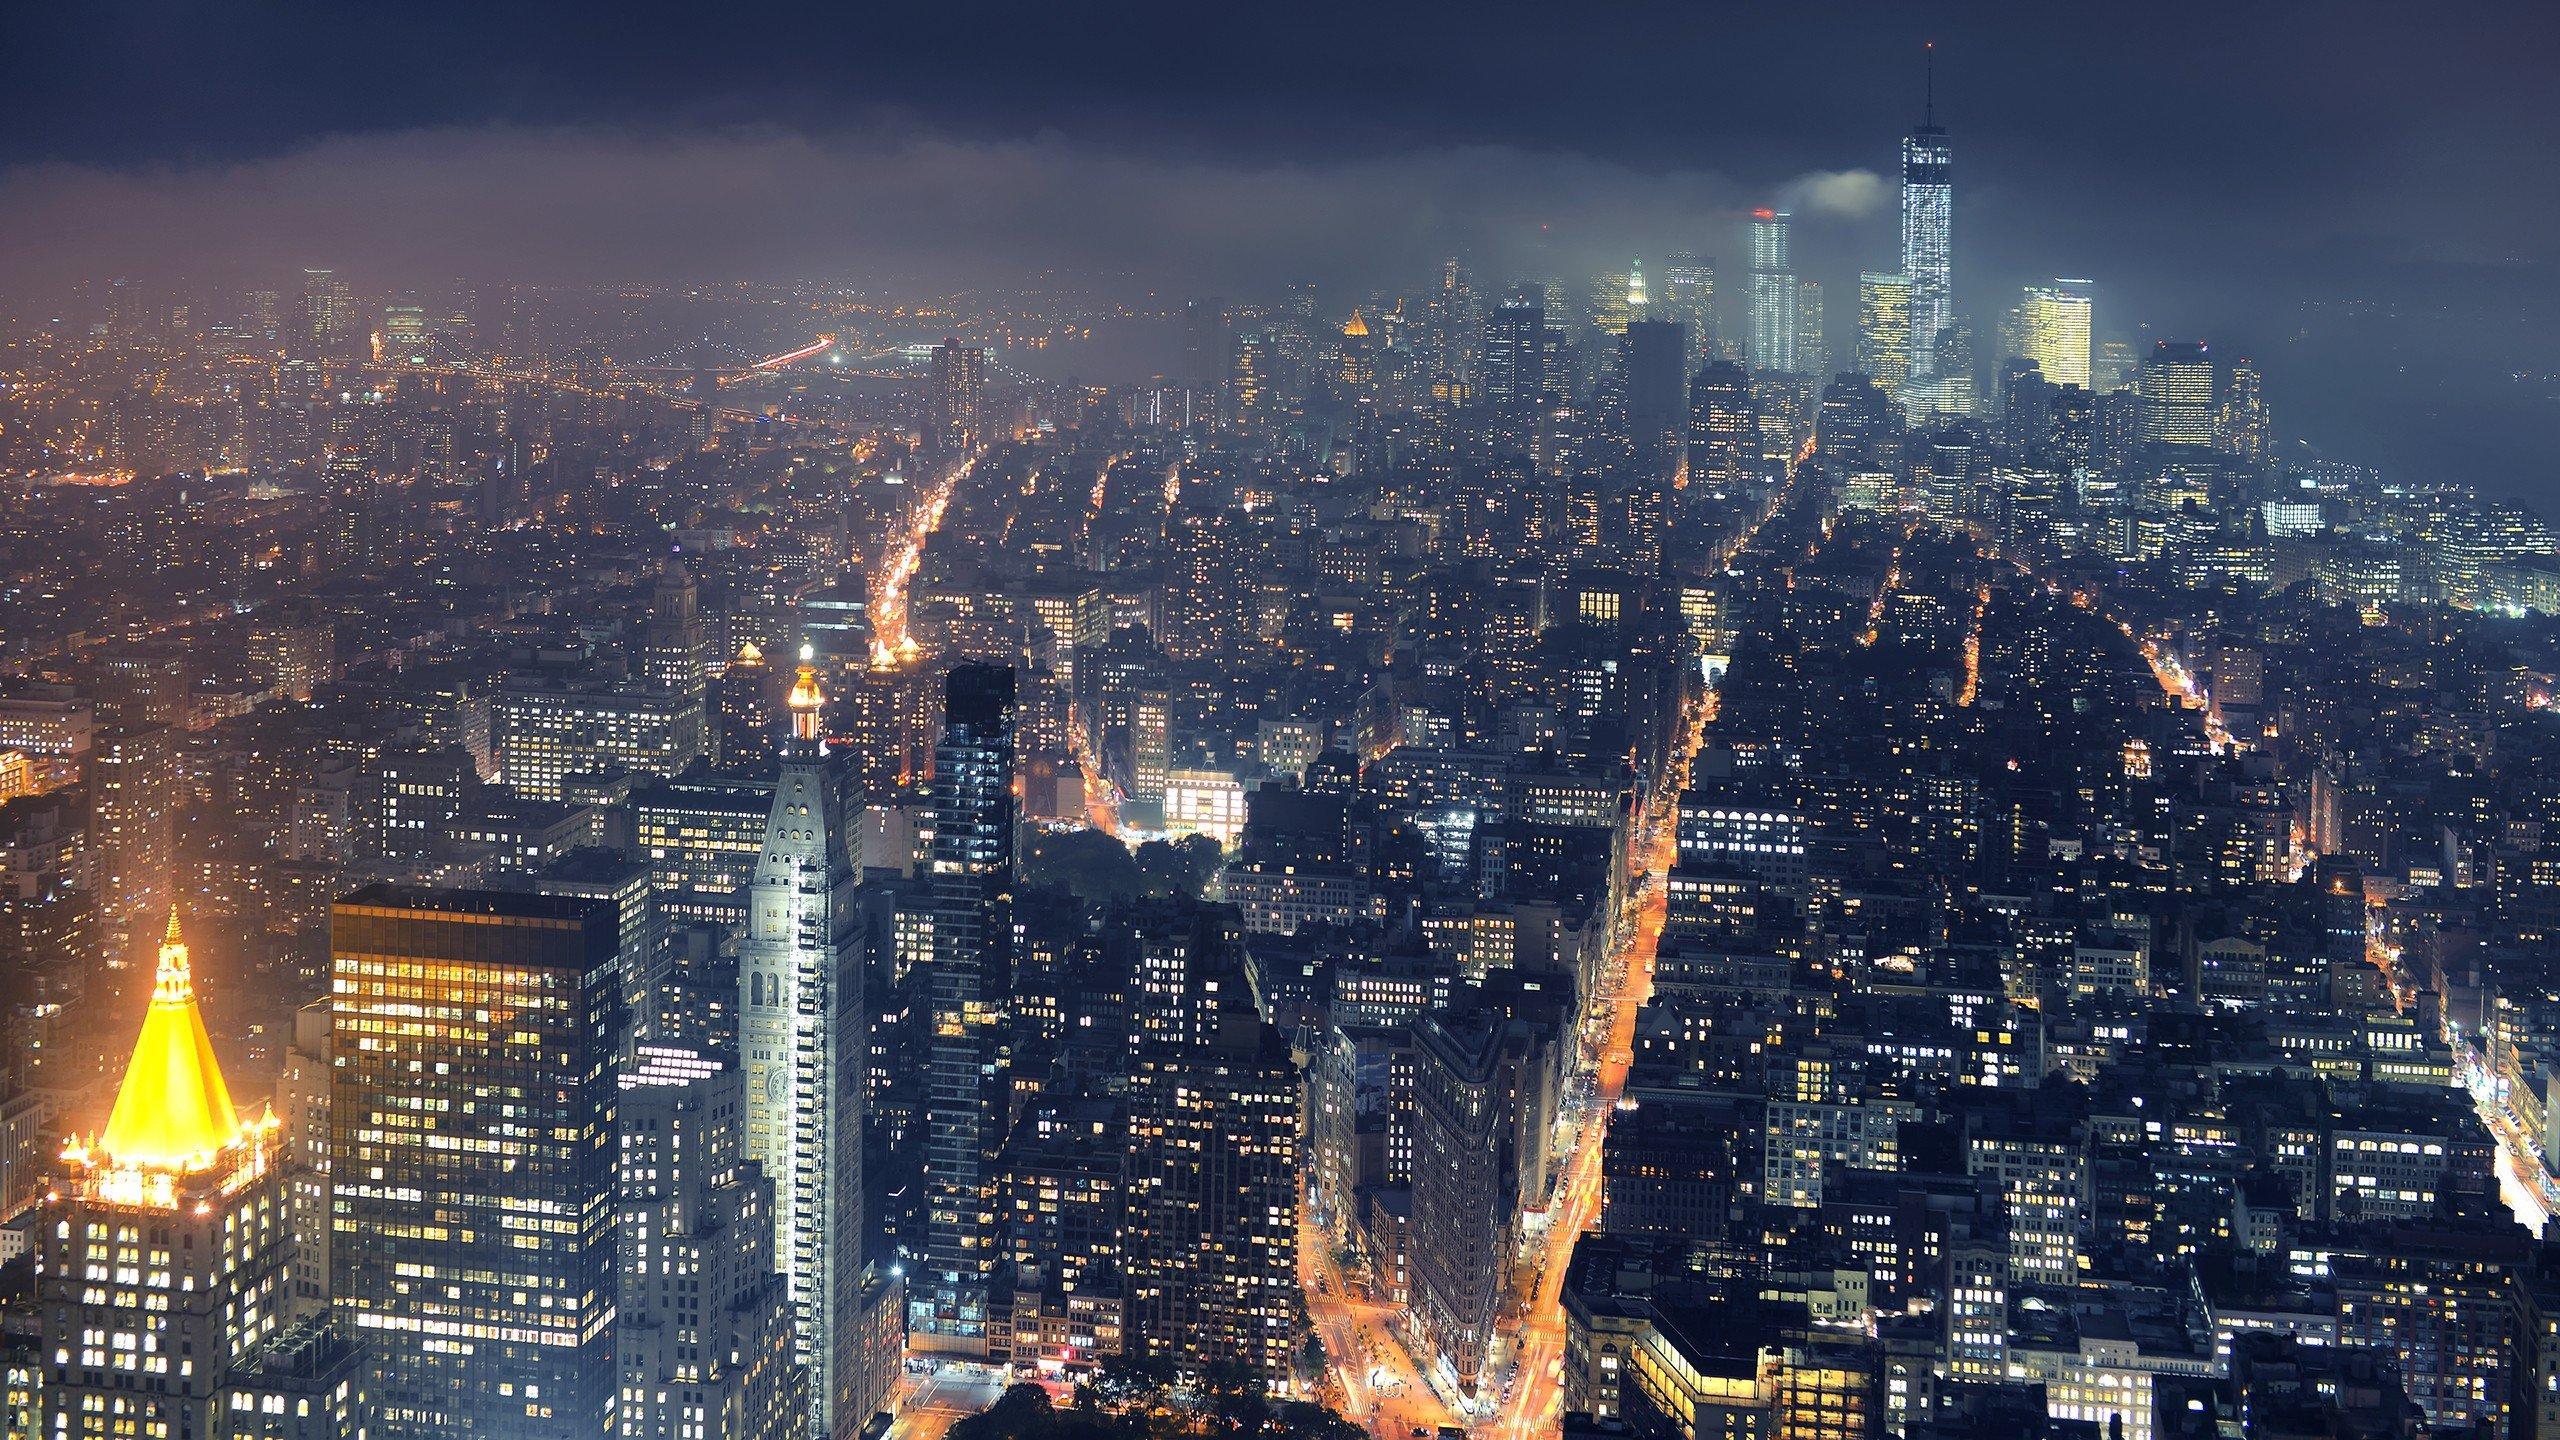 Wallpaper 2560x1440 Px City Cityscape Lights Mist